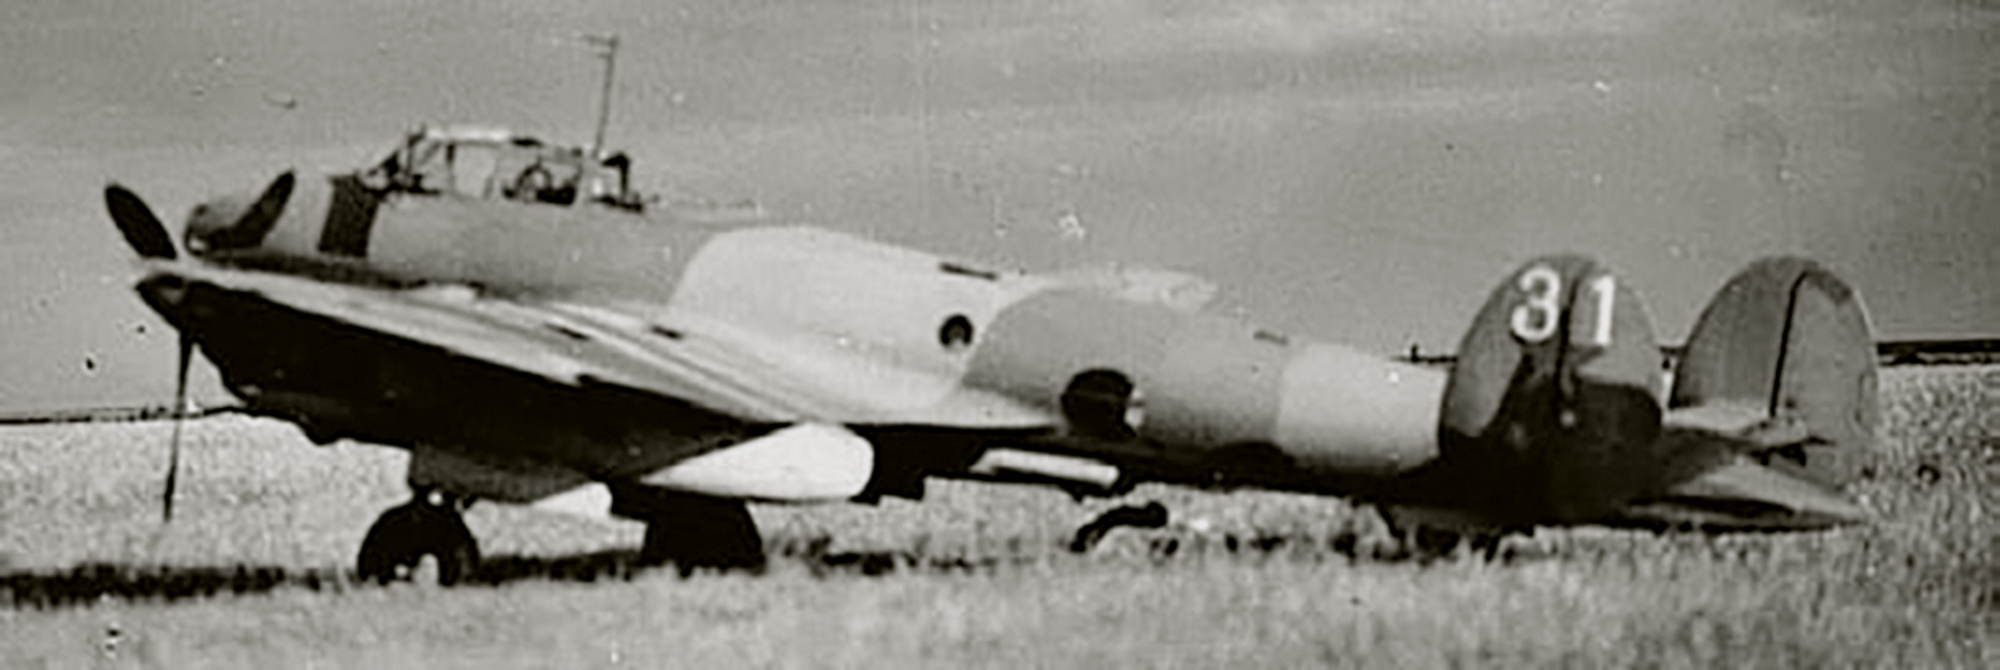 Petlyakov Pe 2 317ORAP White 31 based in the Odessa region summer 1941 01